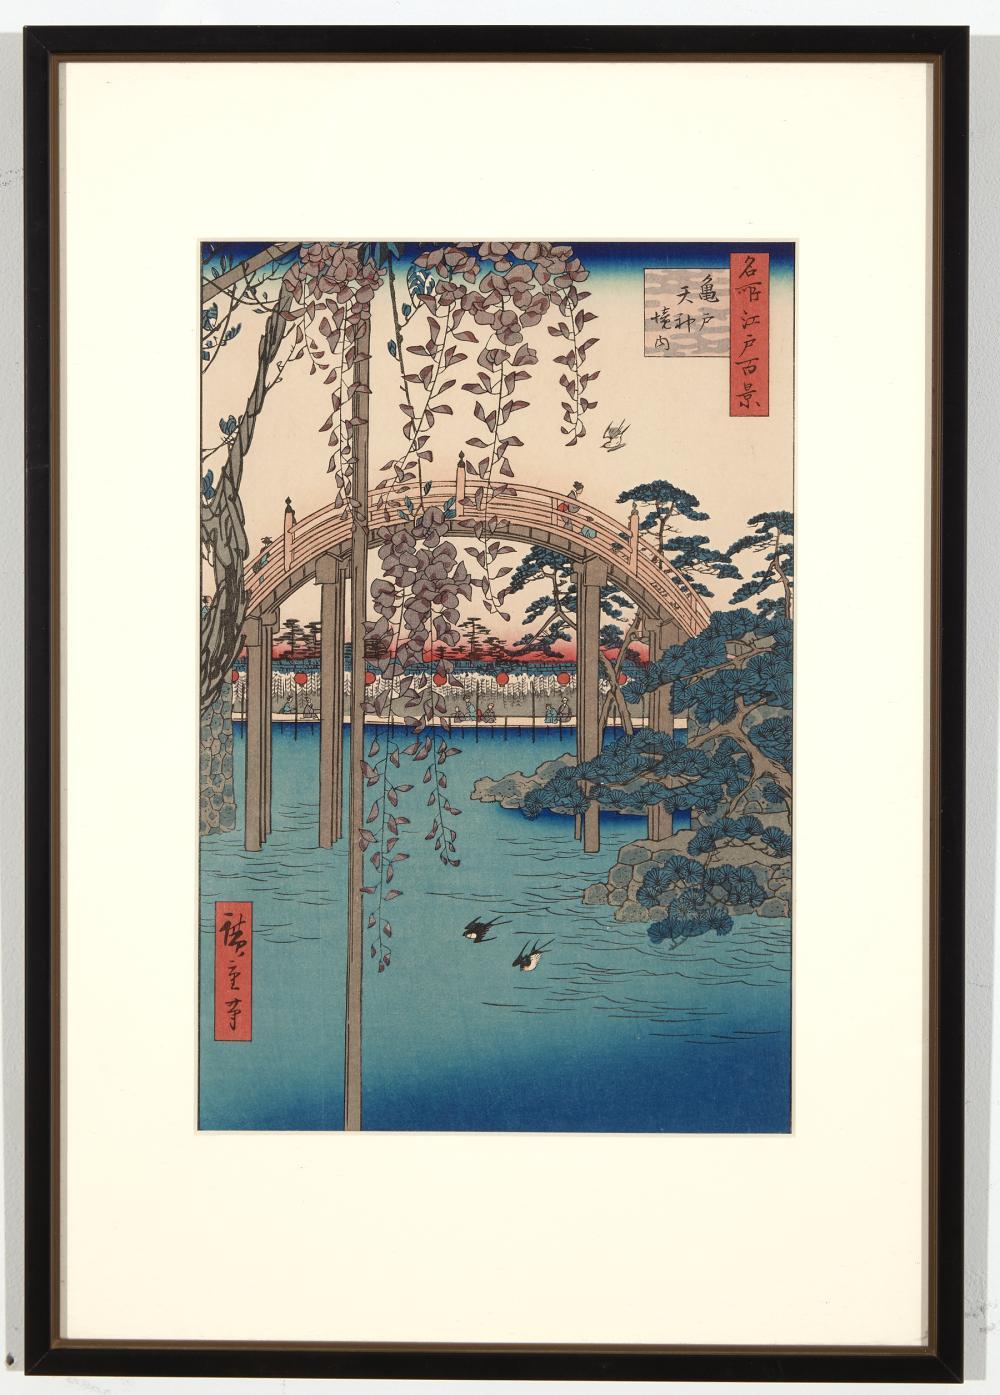 Japanese Woodblock Print-Grounds of Kameido Tenjin Shrine